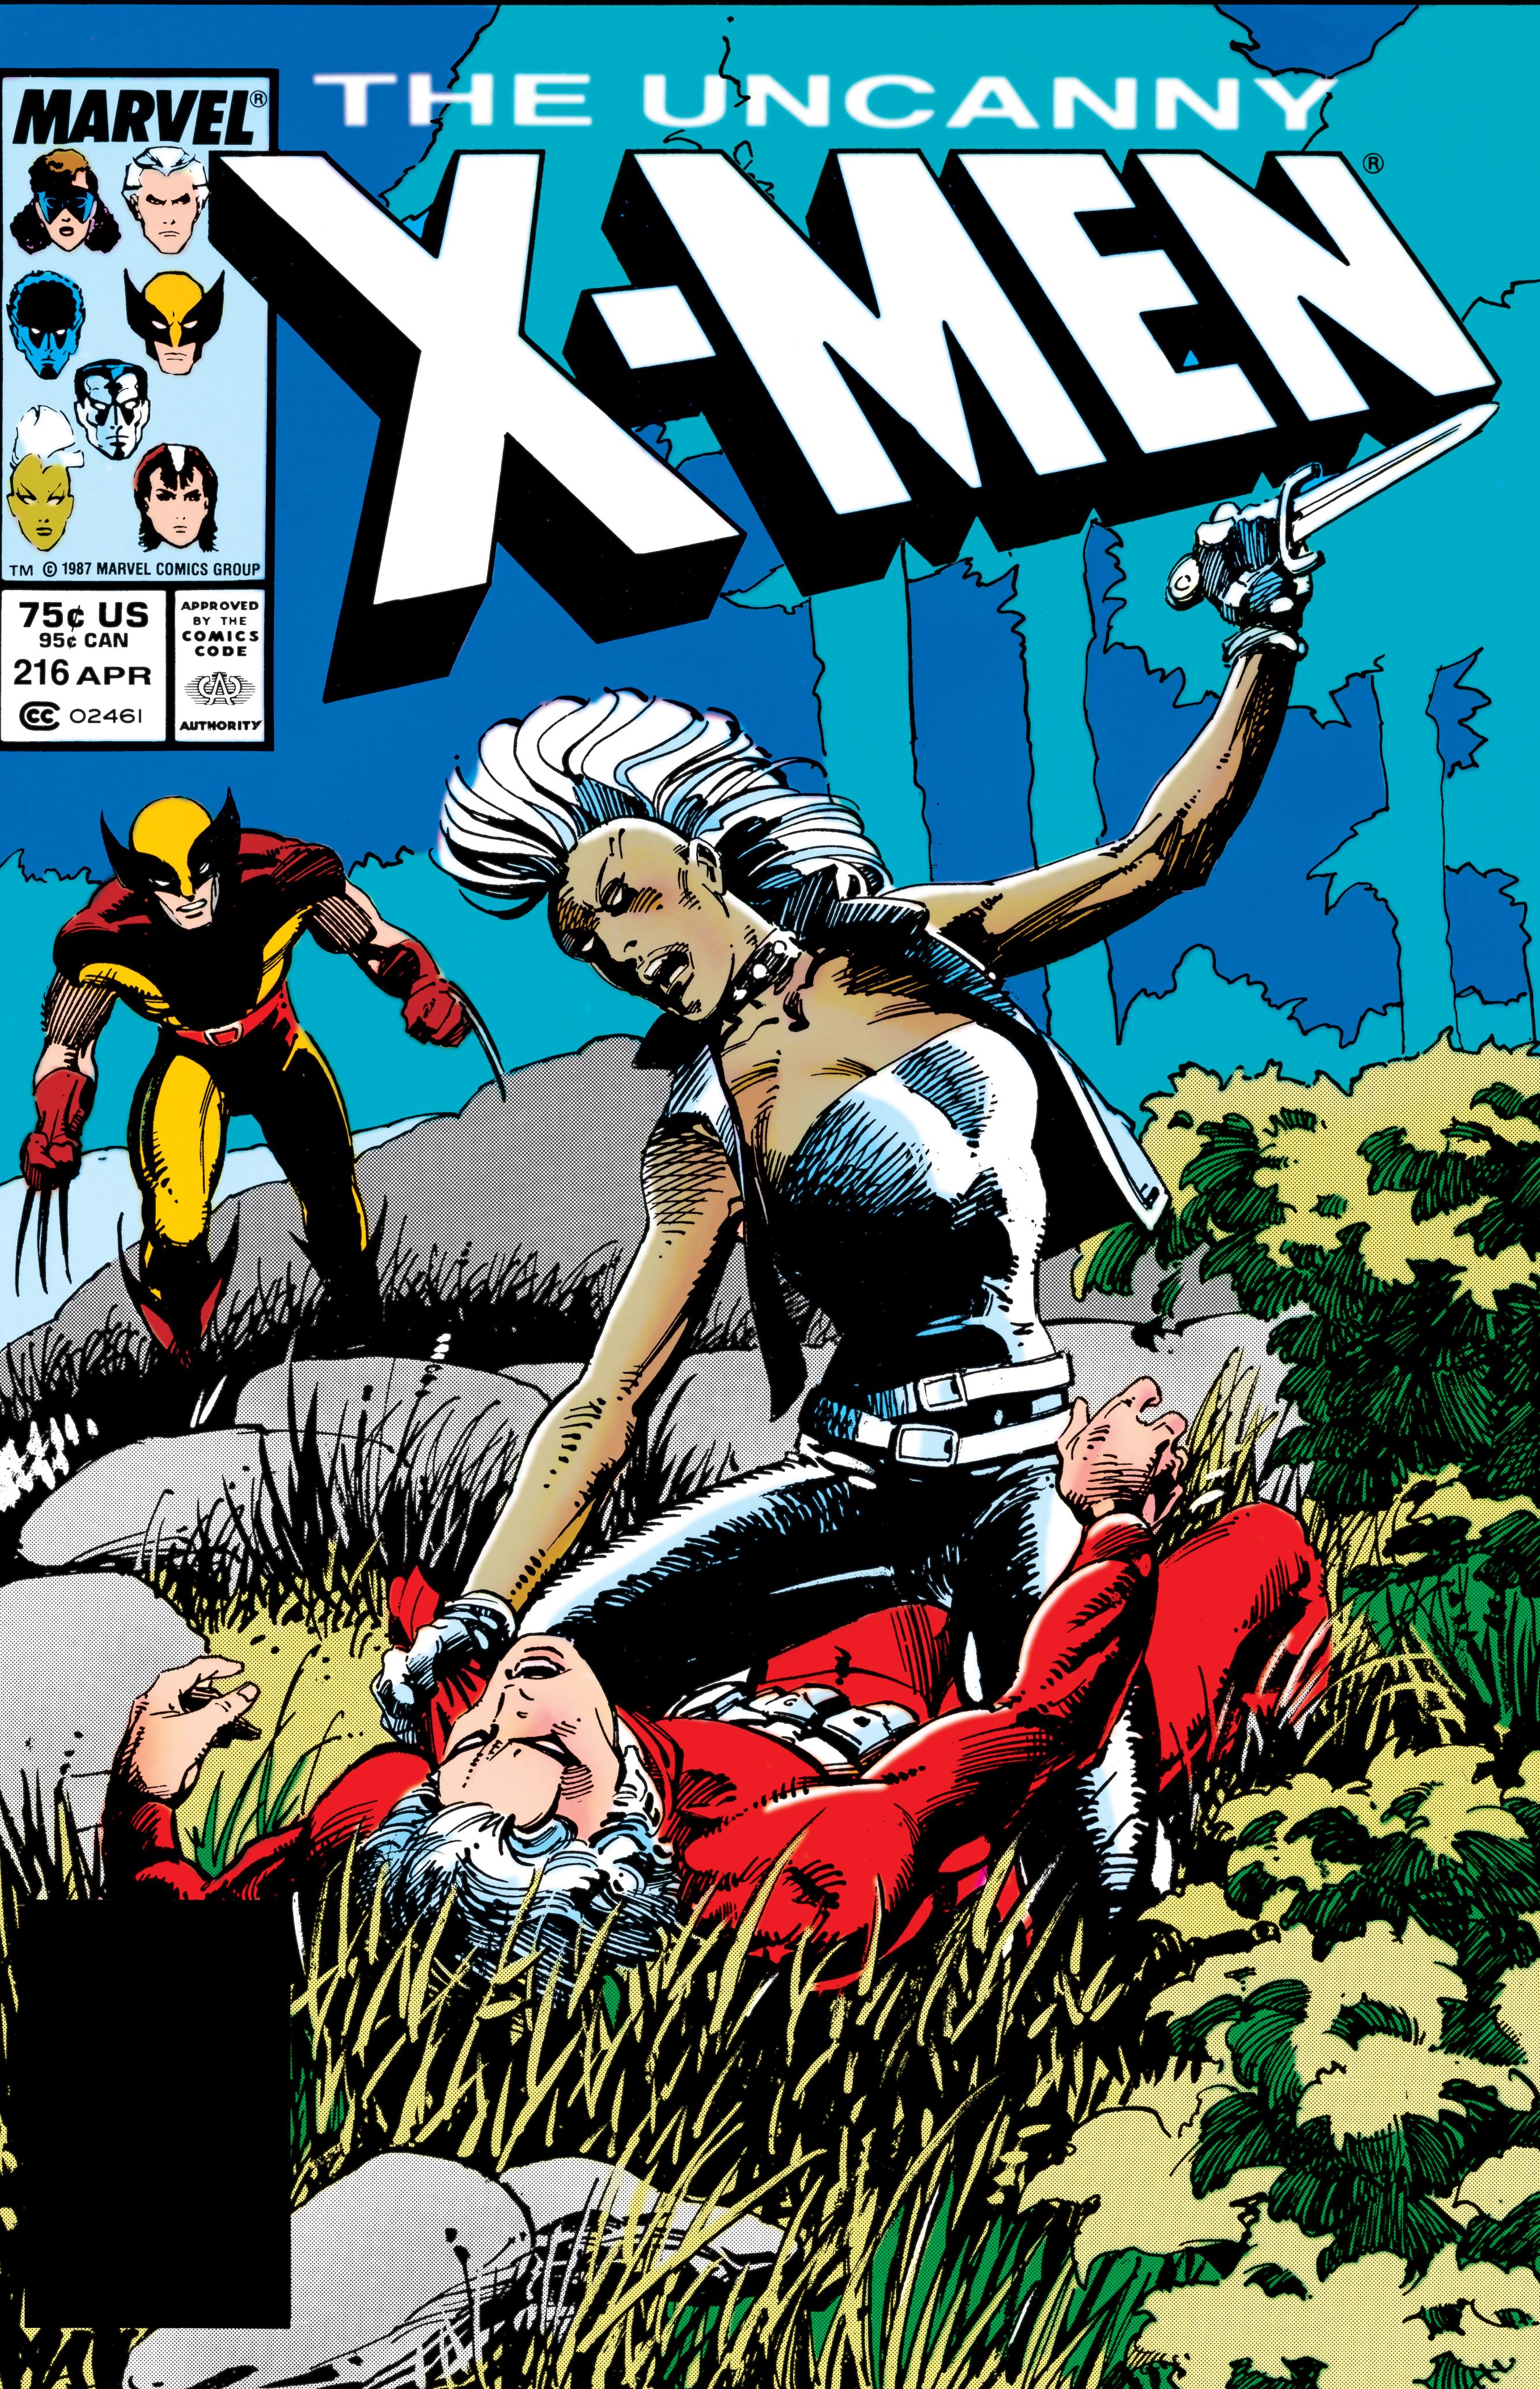 Uncanny X-Men (1963) #216